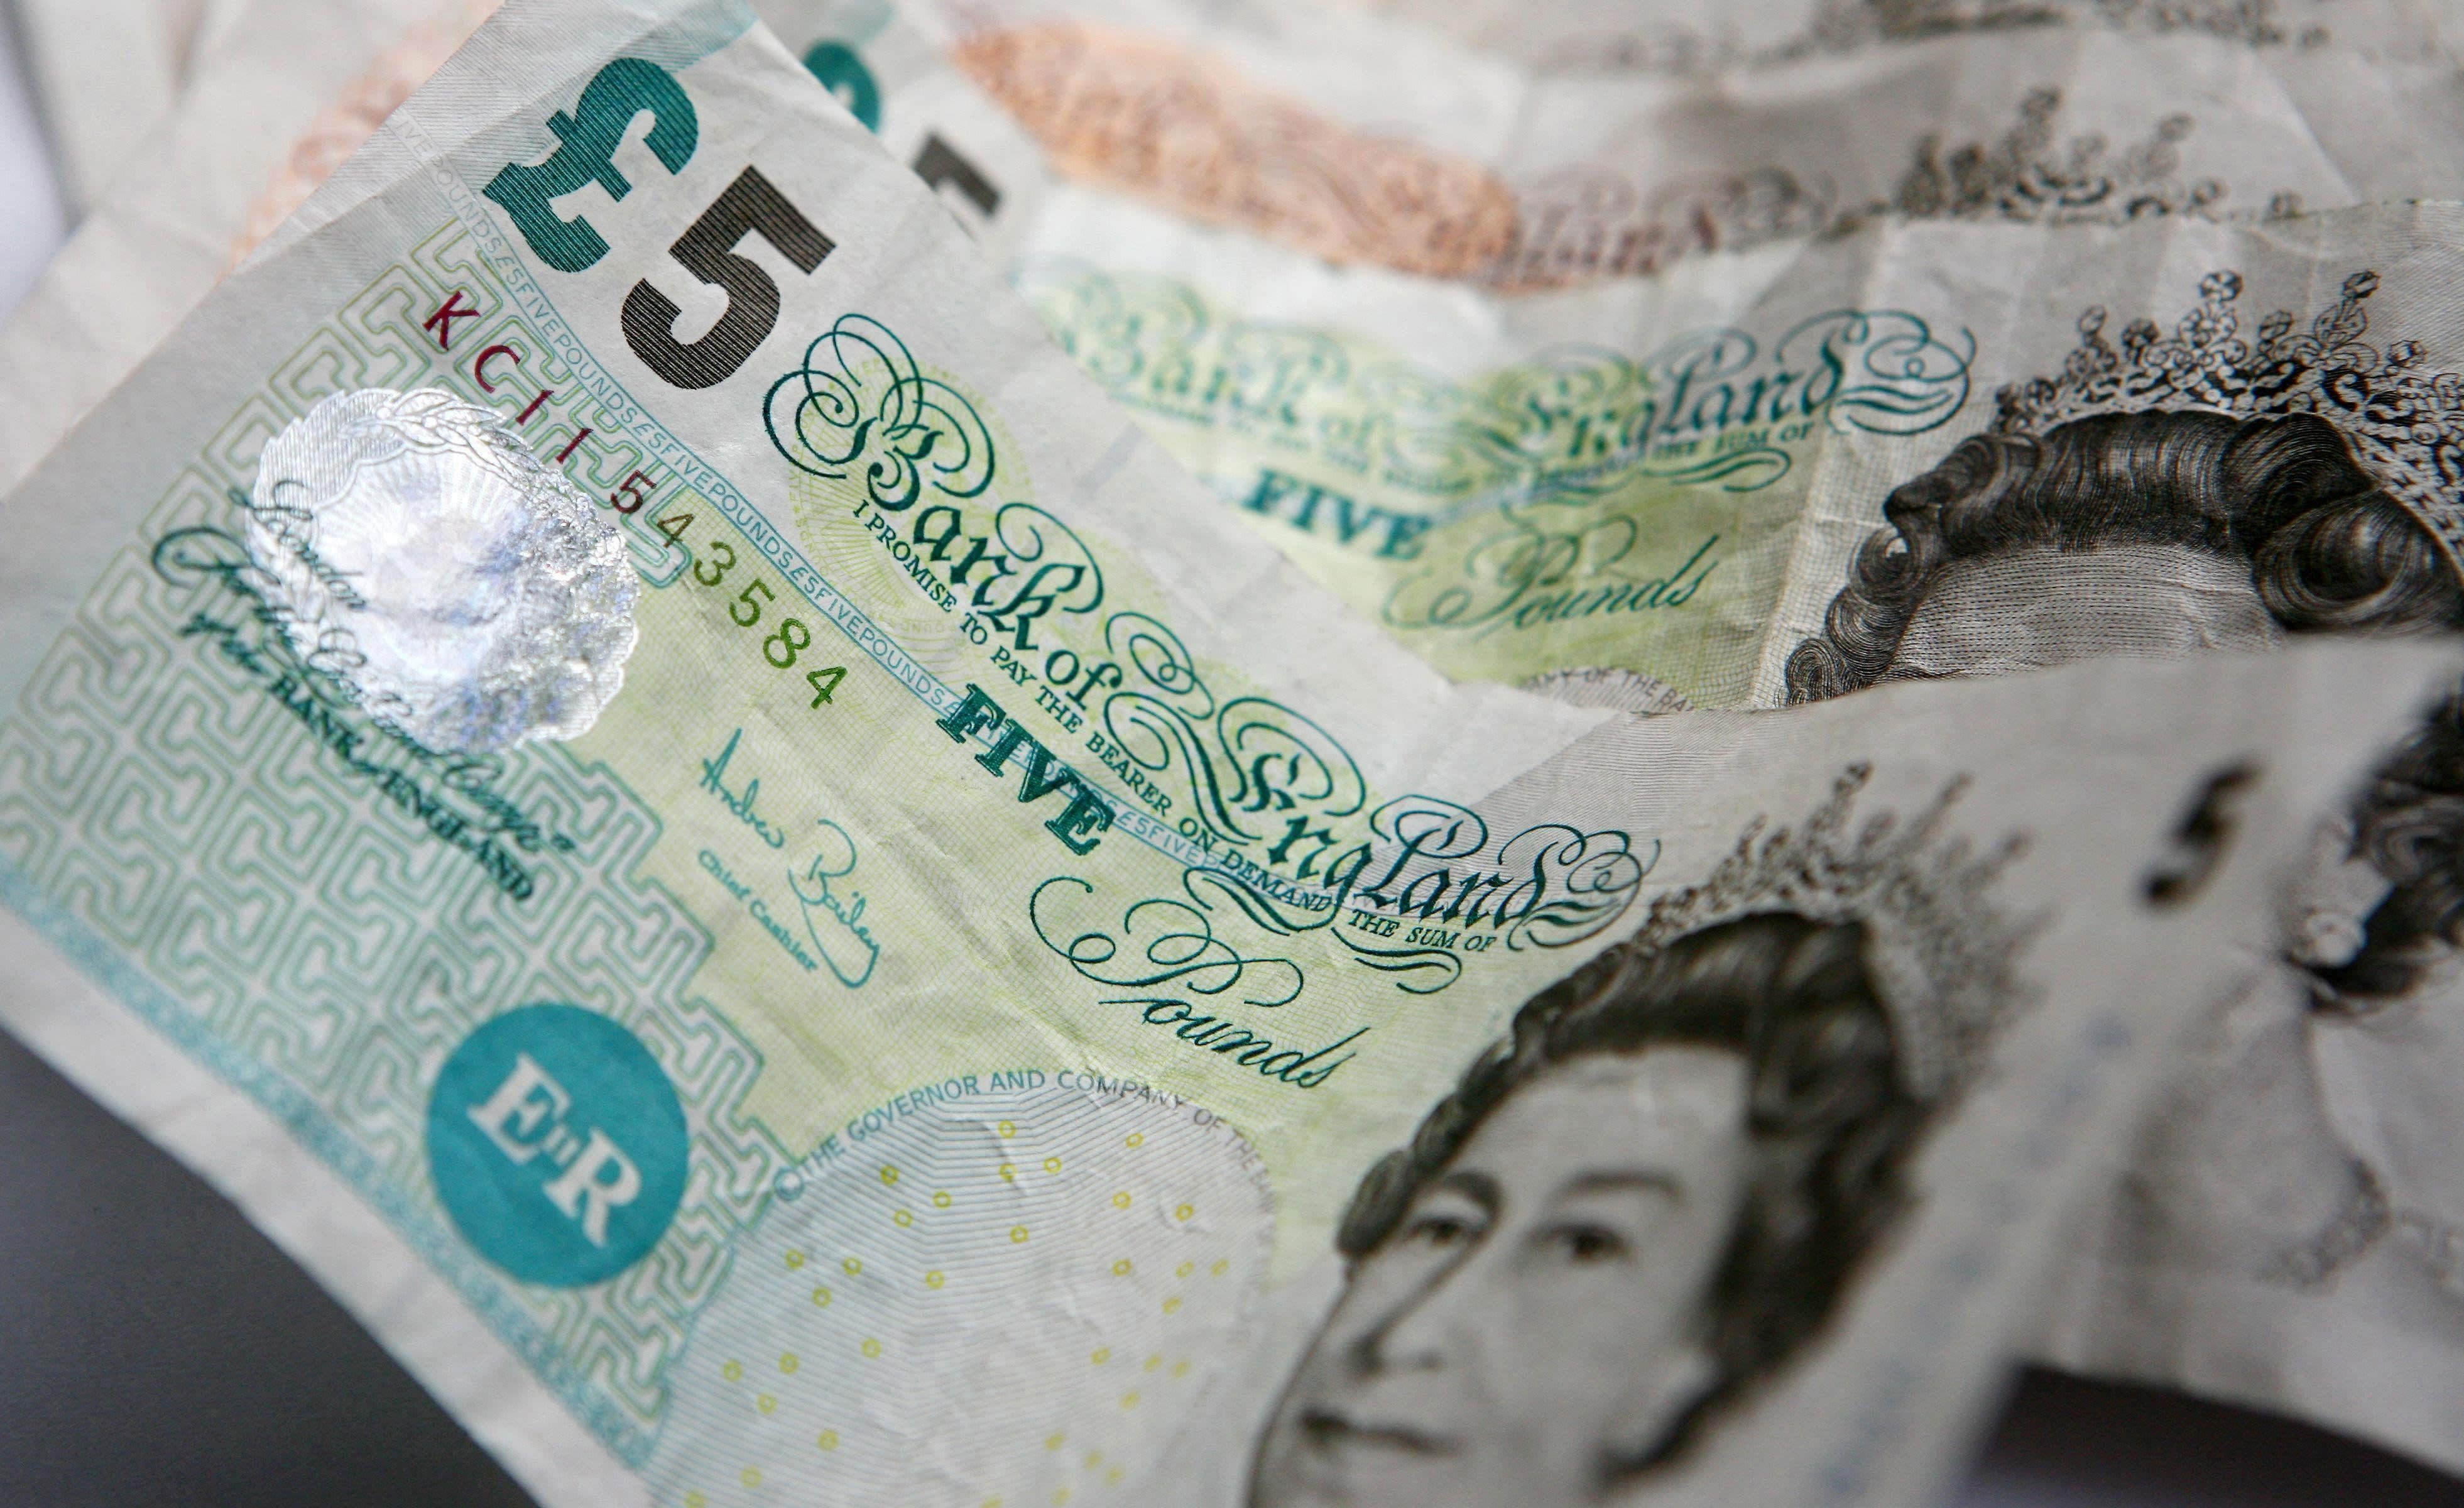 Goldman Sachs buys NN Investment Partners for £1.36bn